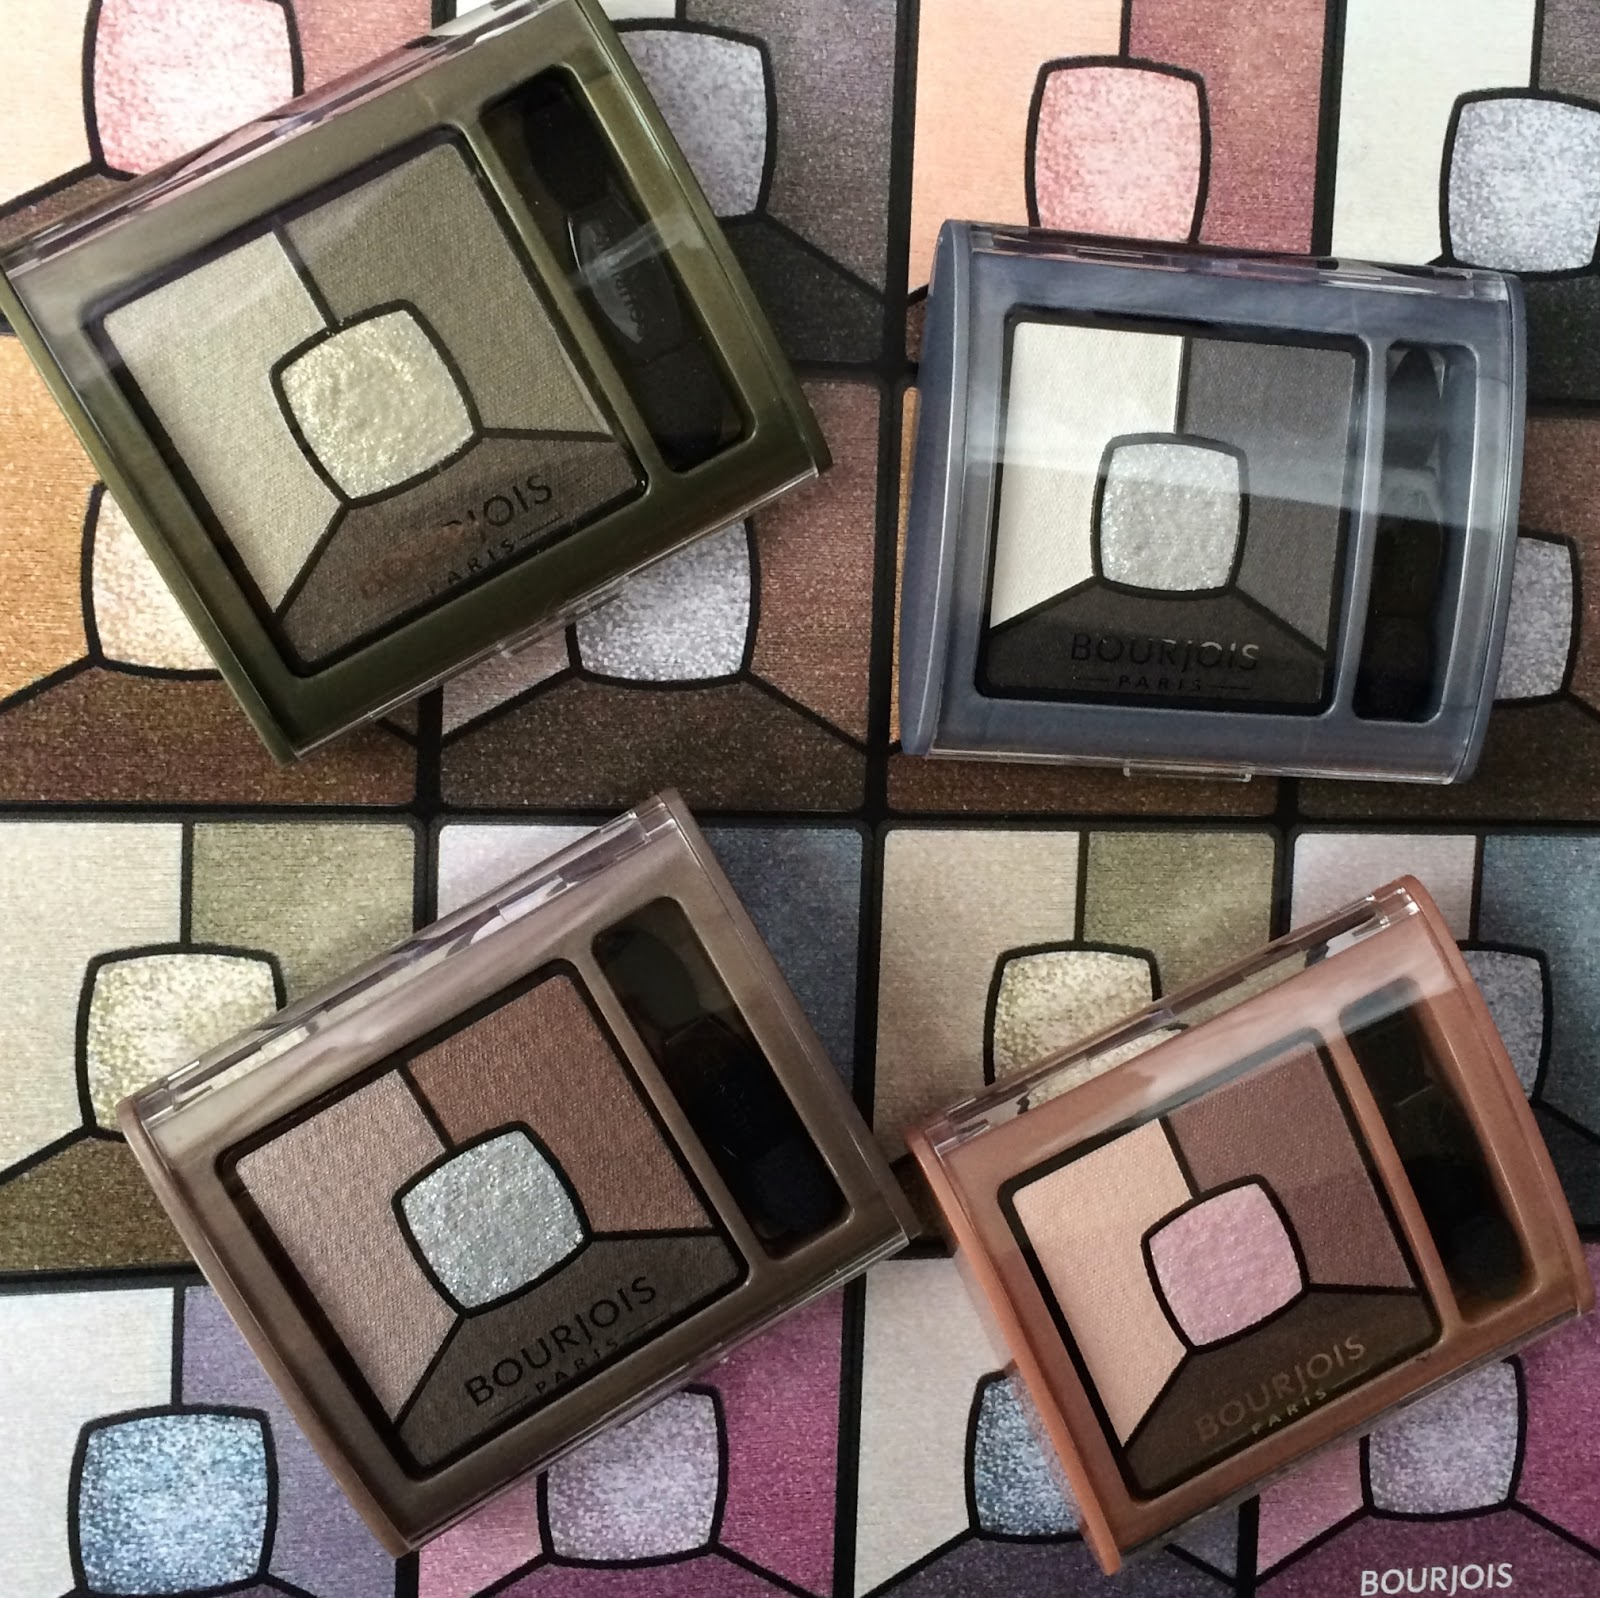 Bourjois-Quad-Smoky-Stories-eyeshadow-Palette-review-2014